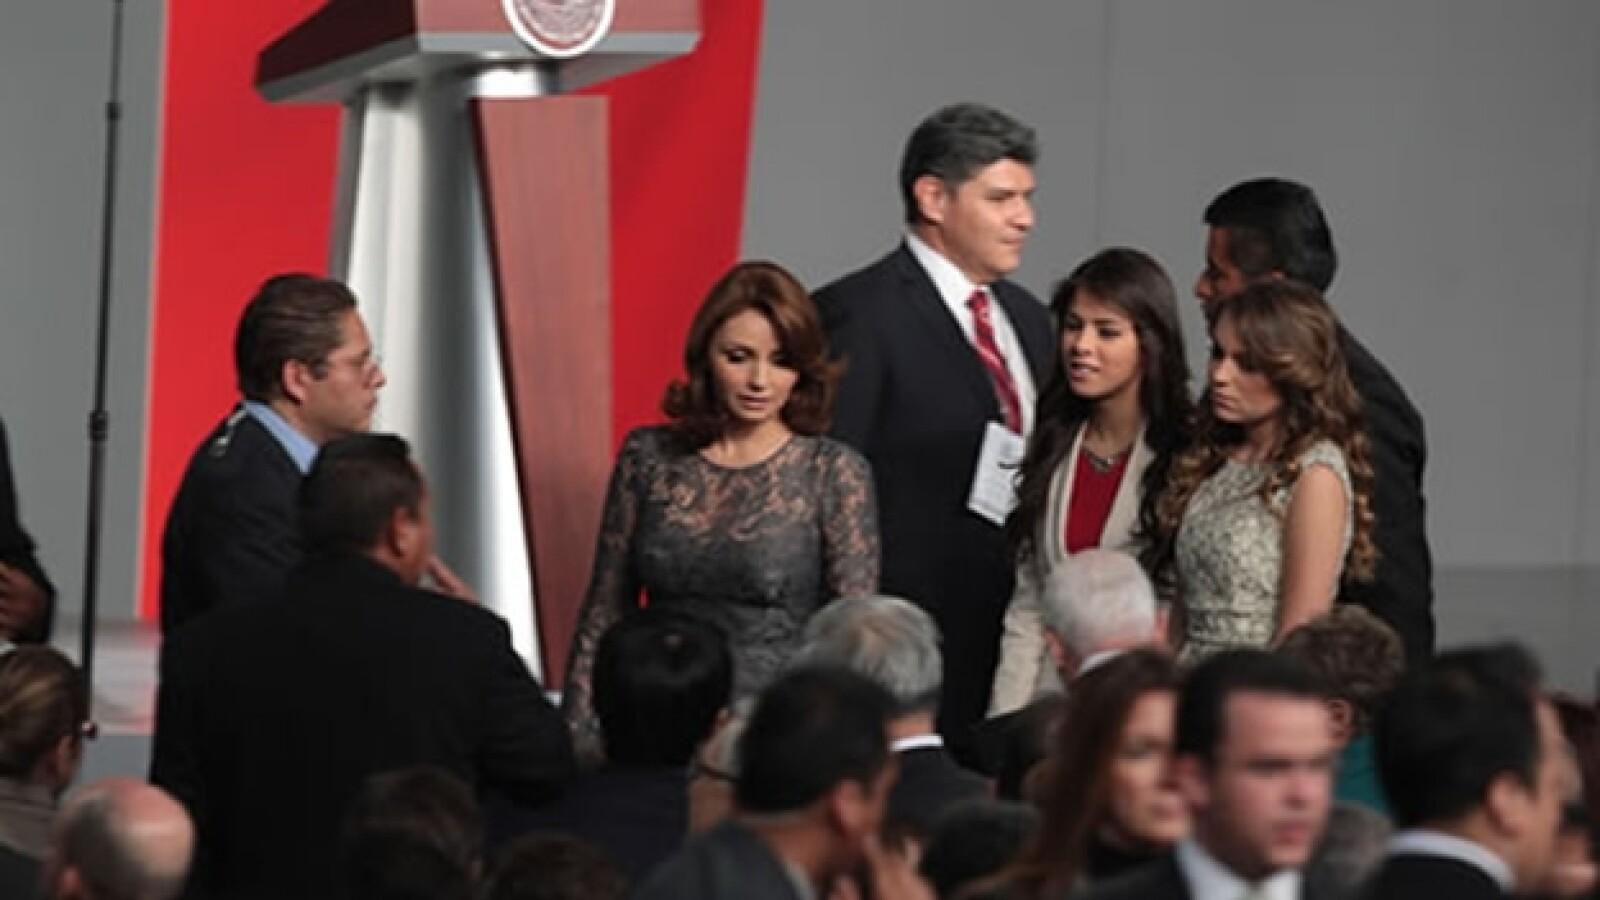 familia Enrique Peña Nieto Palacio Nacional